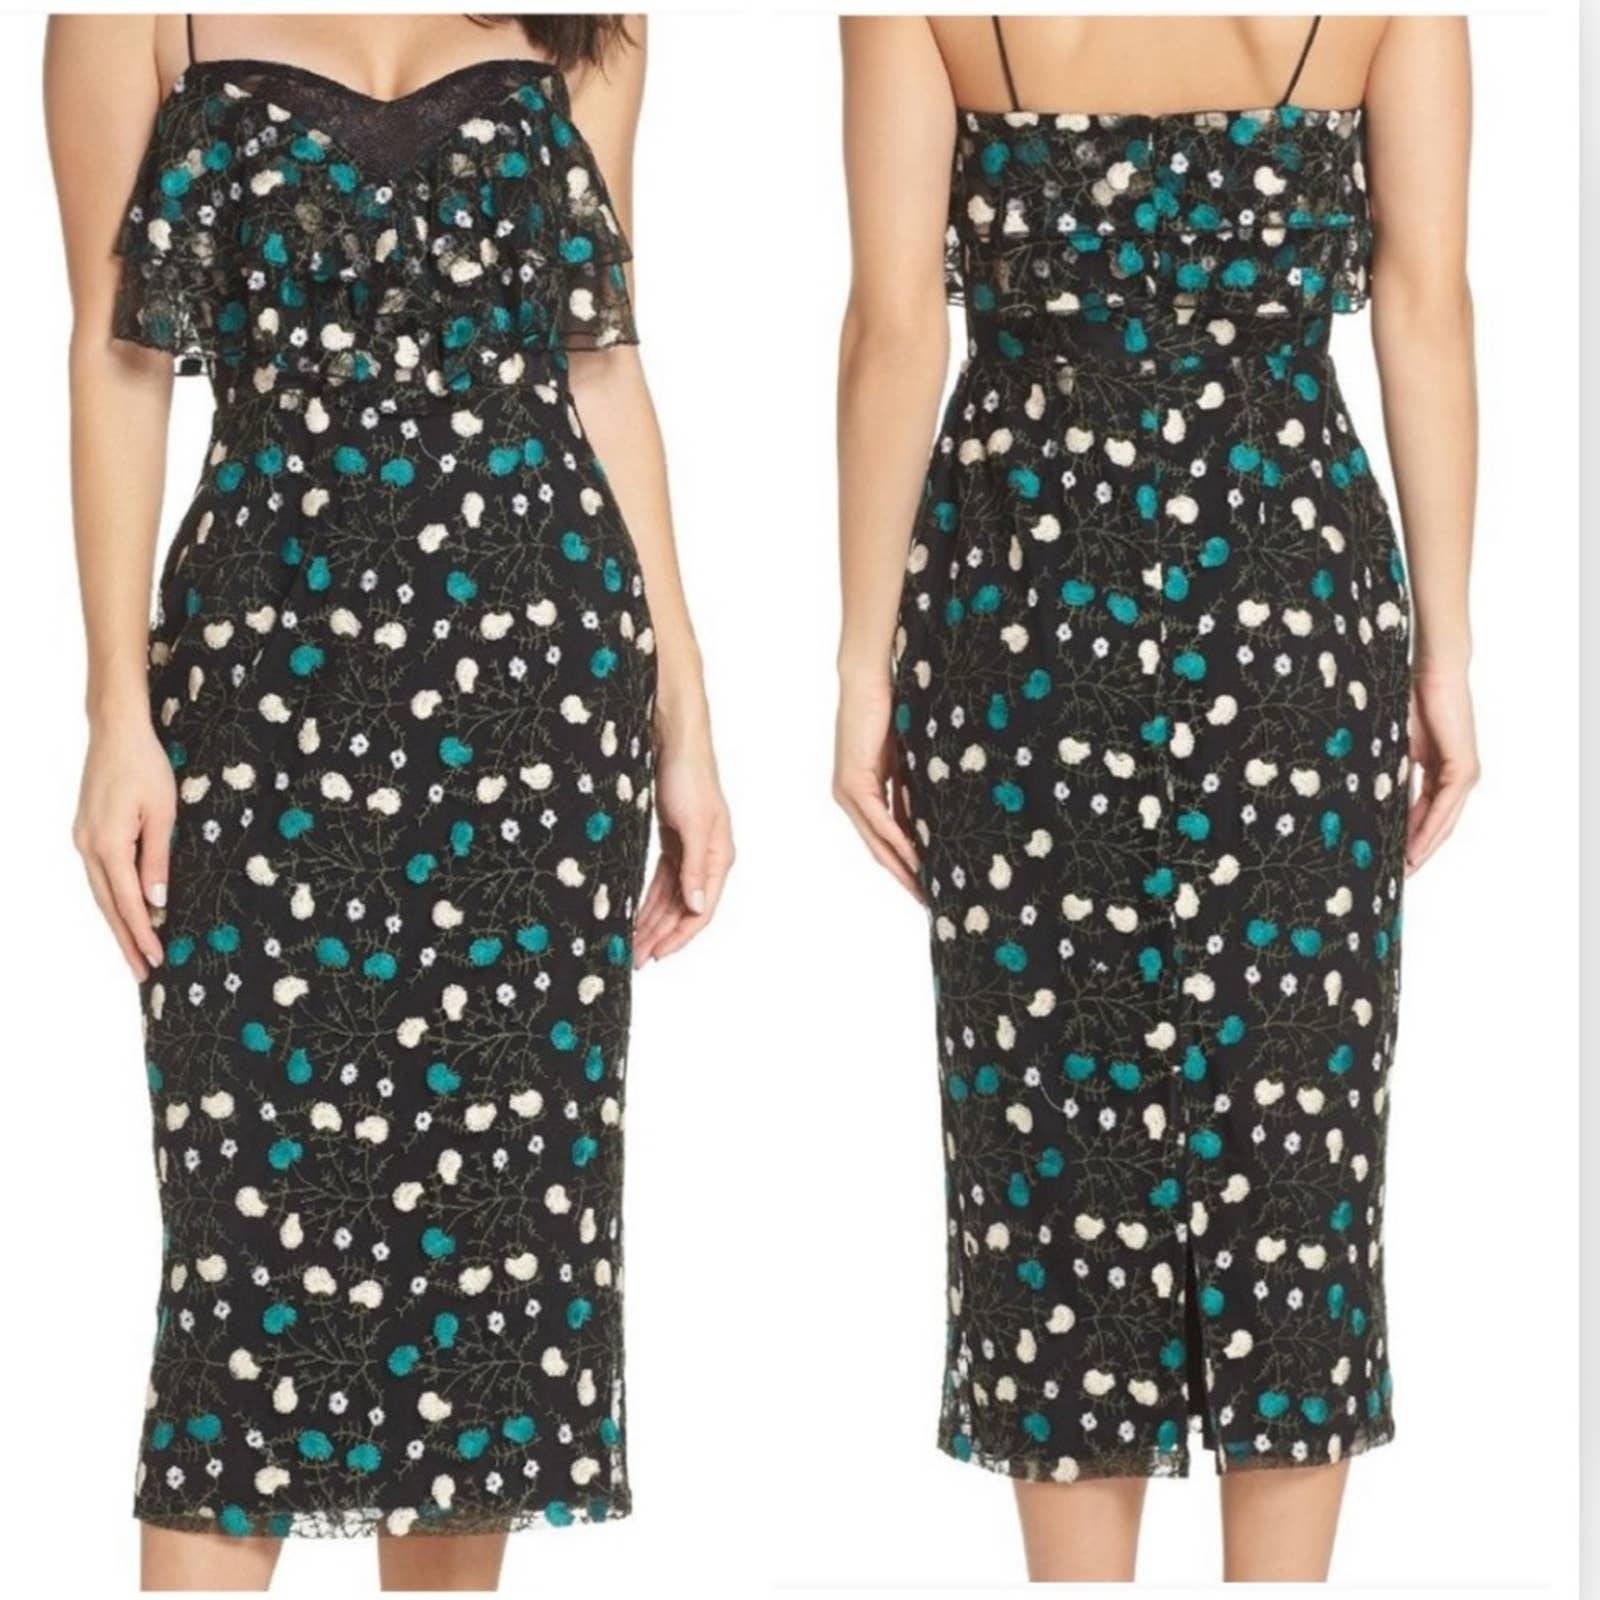 Cooper St Popover Frilled Sheath Dress 6